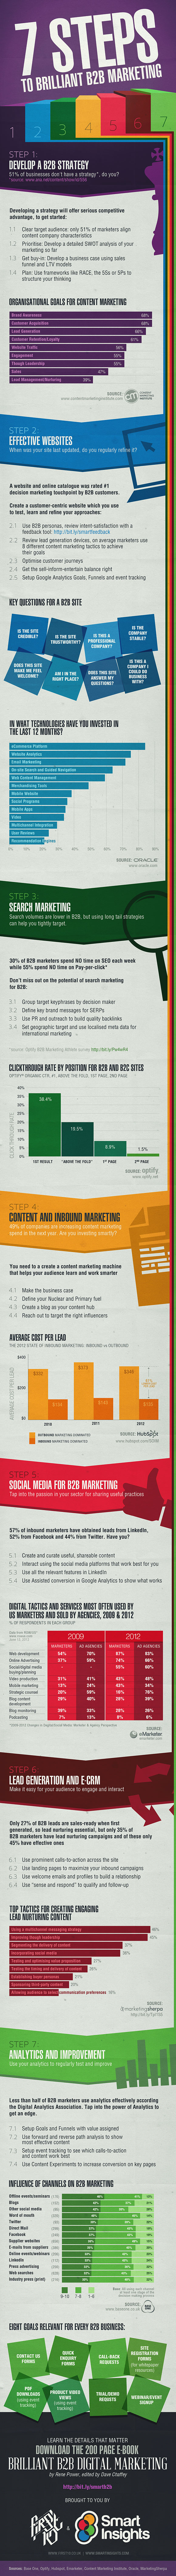 B2B Marketing Plan Outline-Infographic